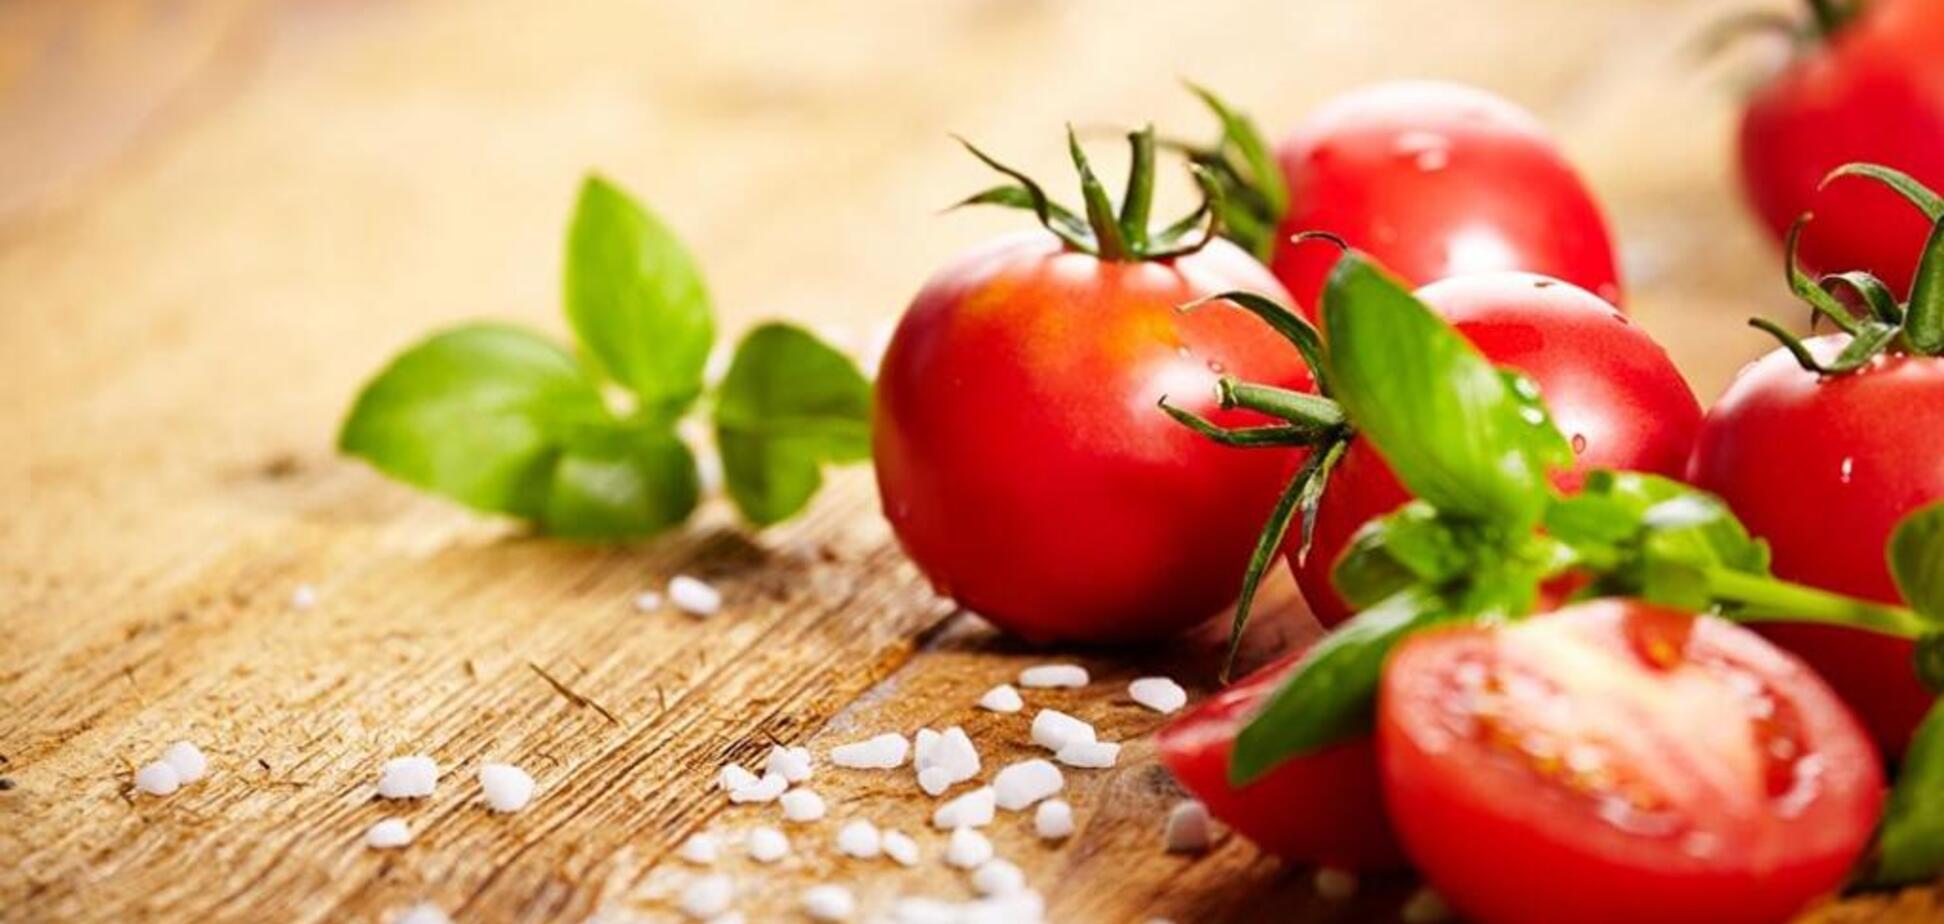 Рецепт самого вкусного салата с помидорами